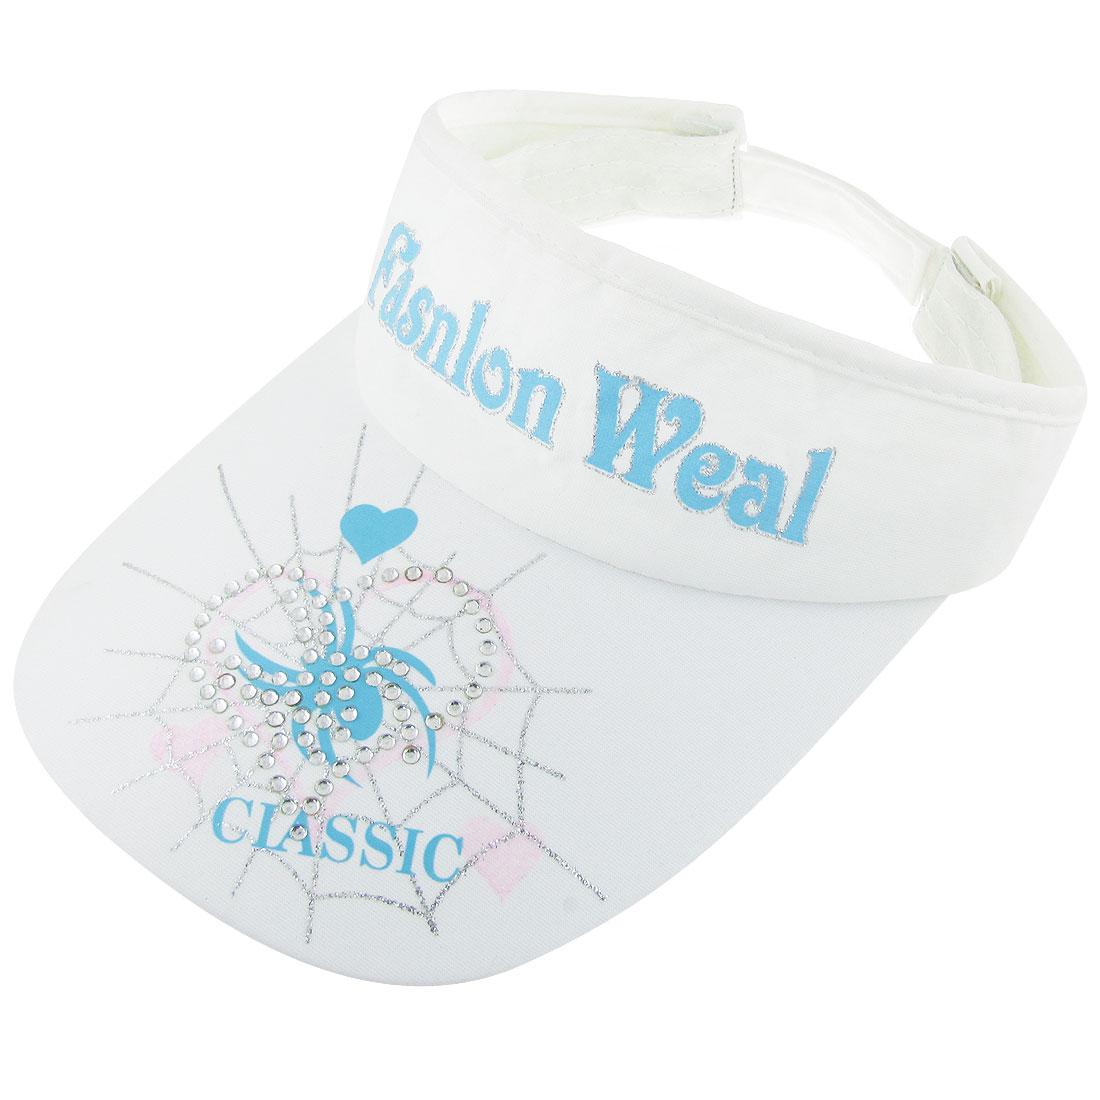 Rhinestone Detail Heart Pattern Mesh Lined Band Sun Visor Cap White Blue for Lady